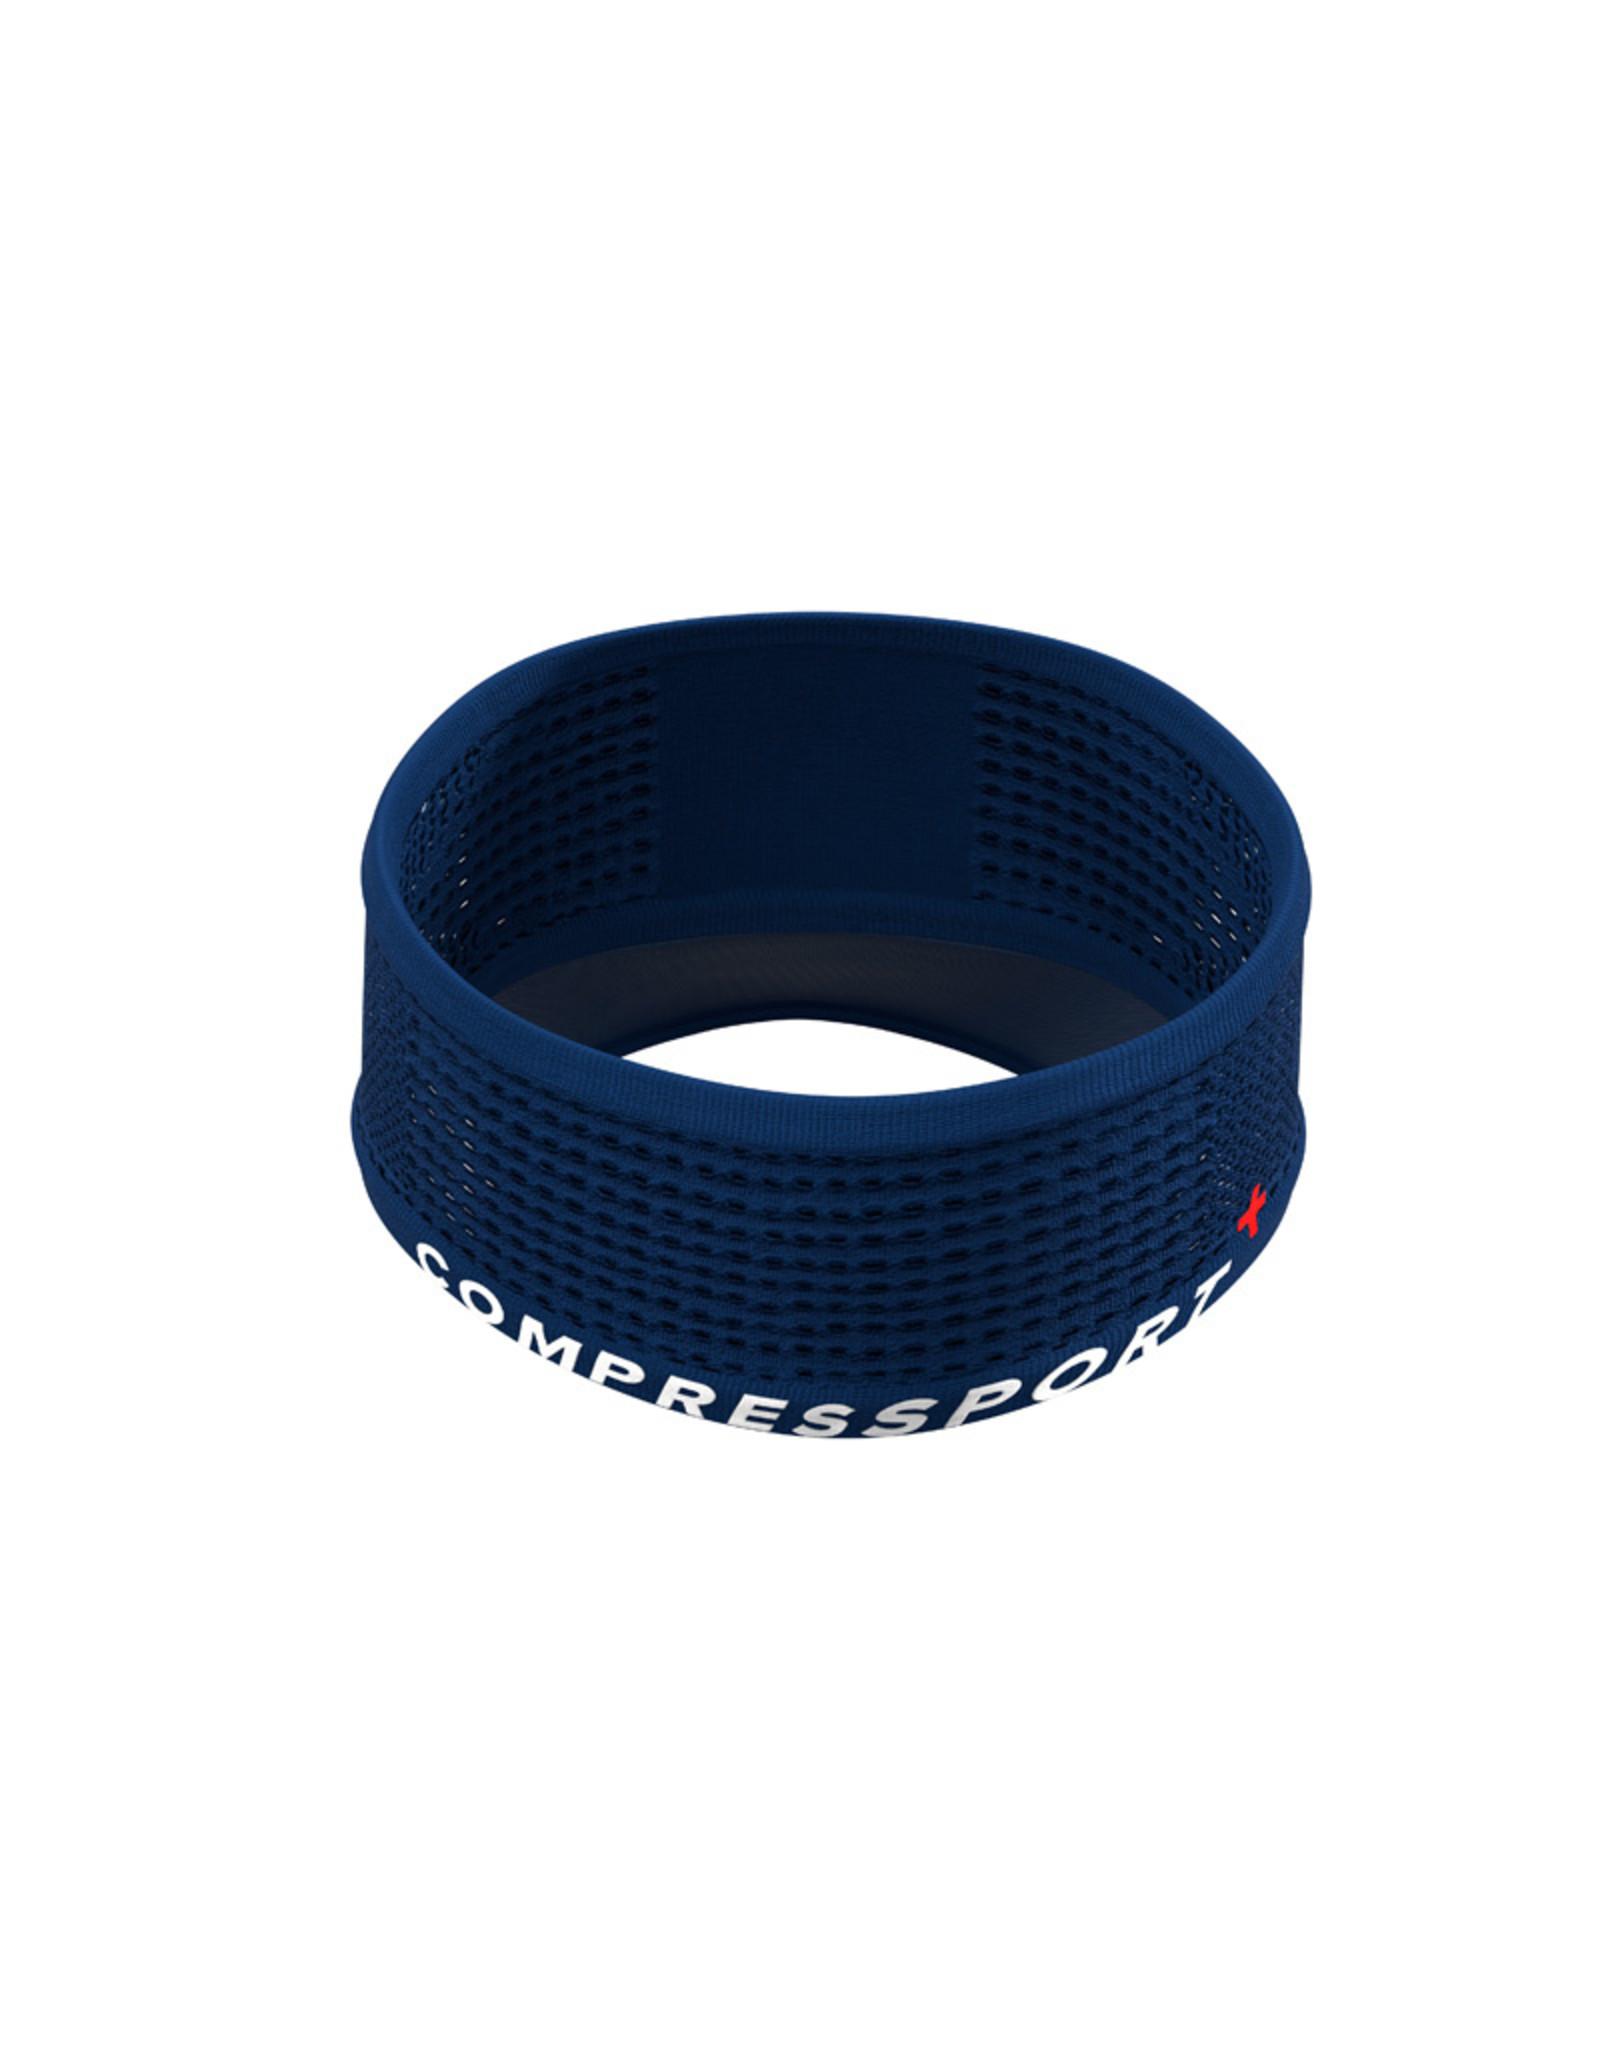 Compressport Spiderweb Headband On/Off - Bleu